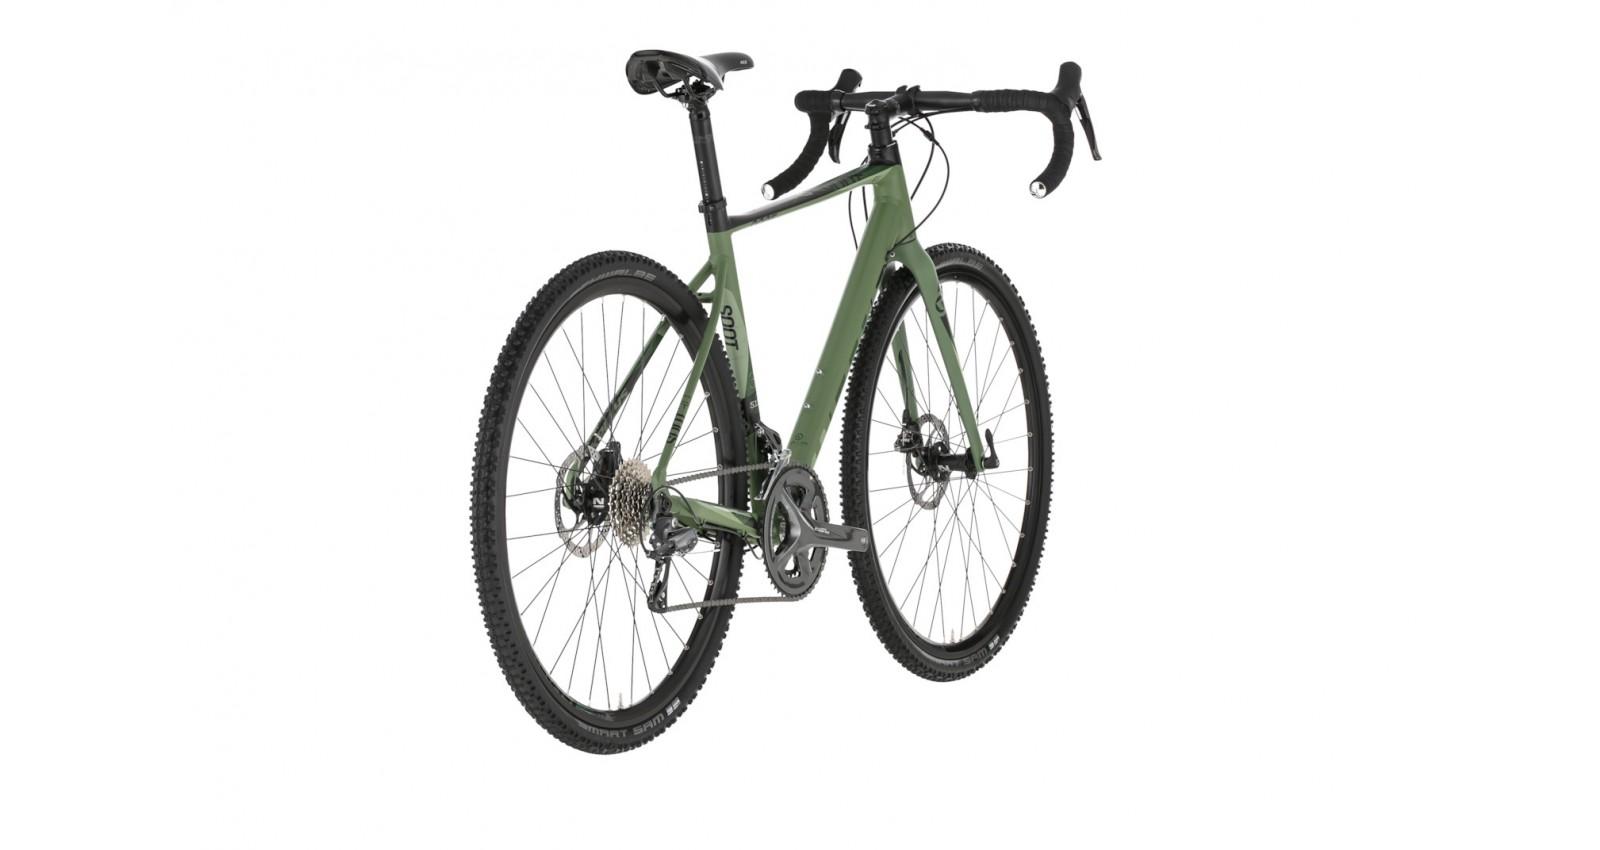 "Велосипед Kellys Soot 30 28"" Green L - № Фото 1 - № Фото 2 - № Фото 3 - № Фото 4"